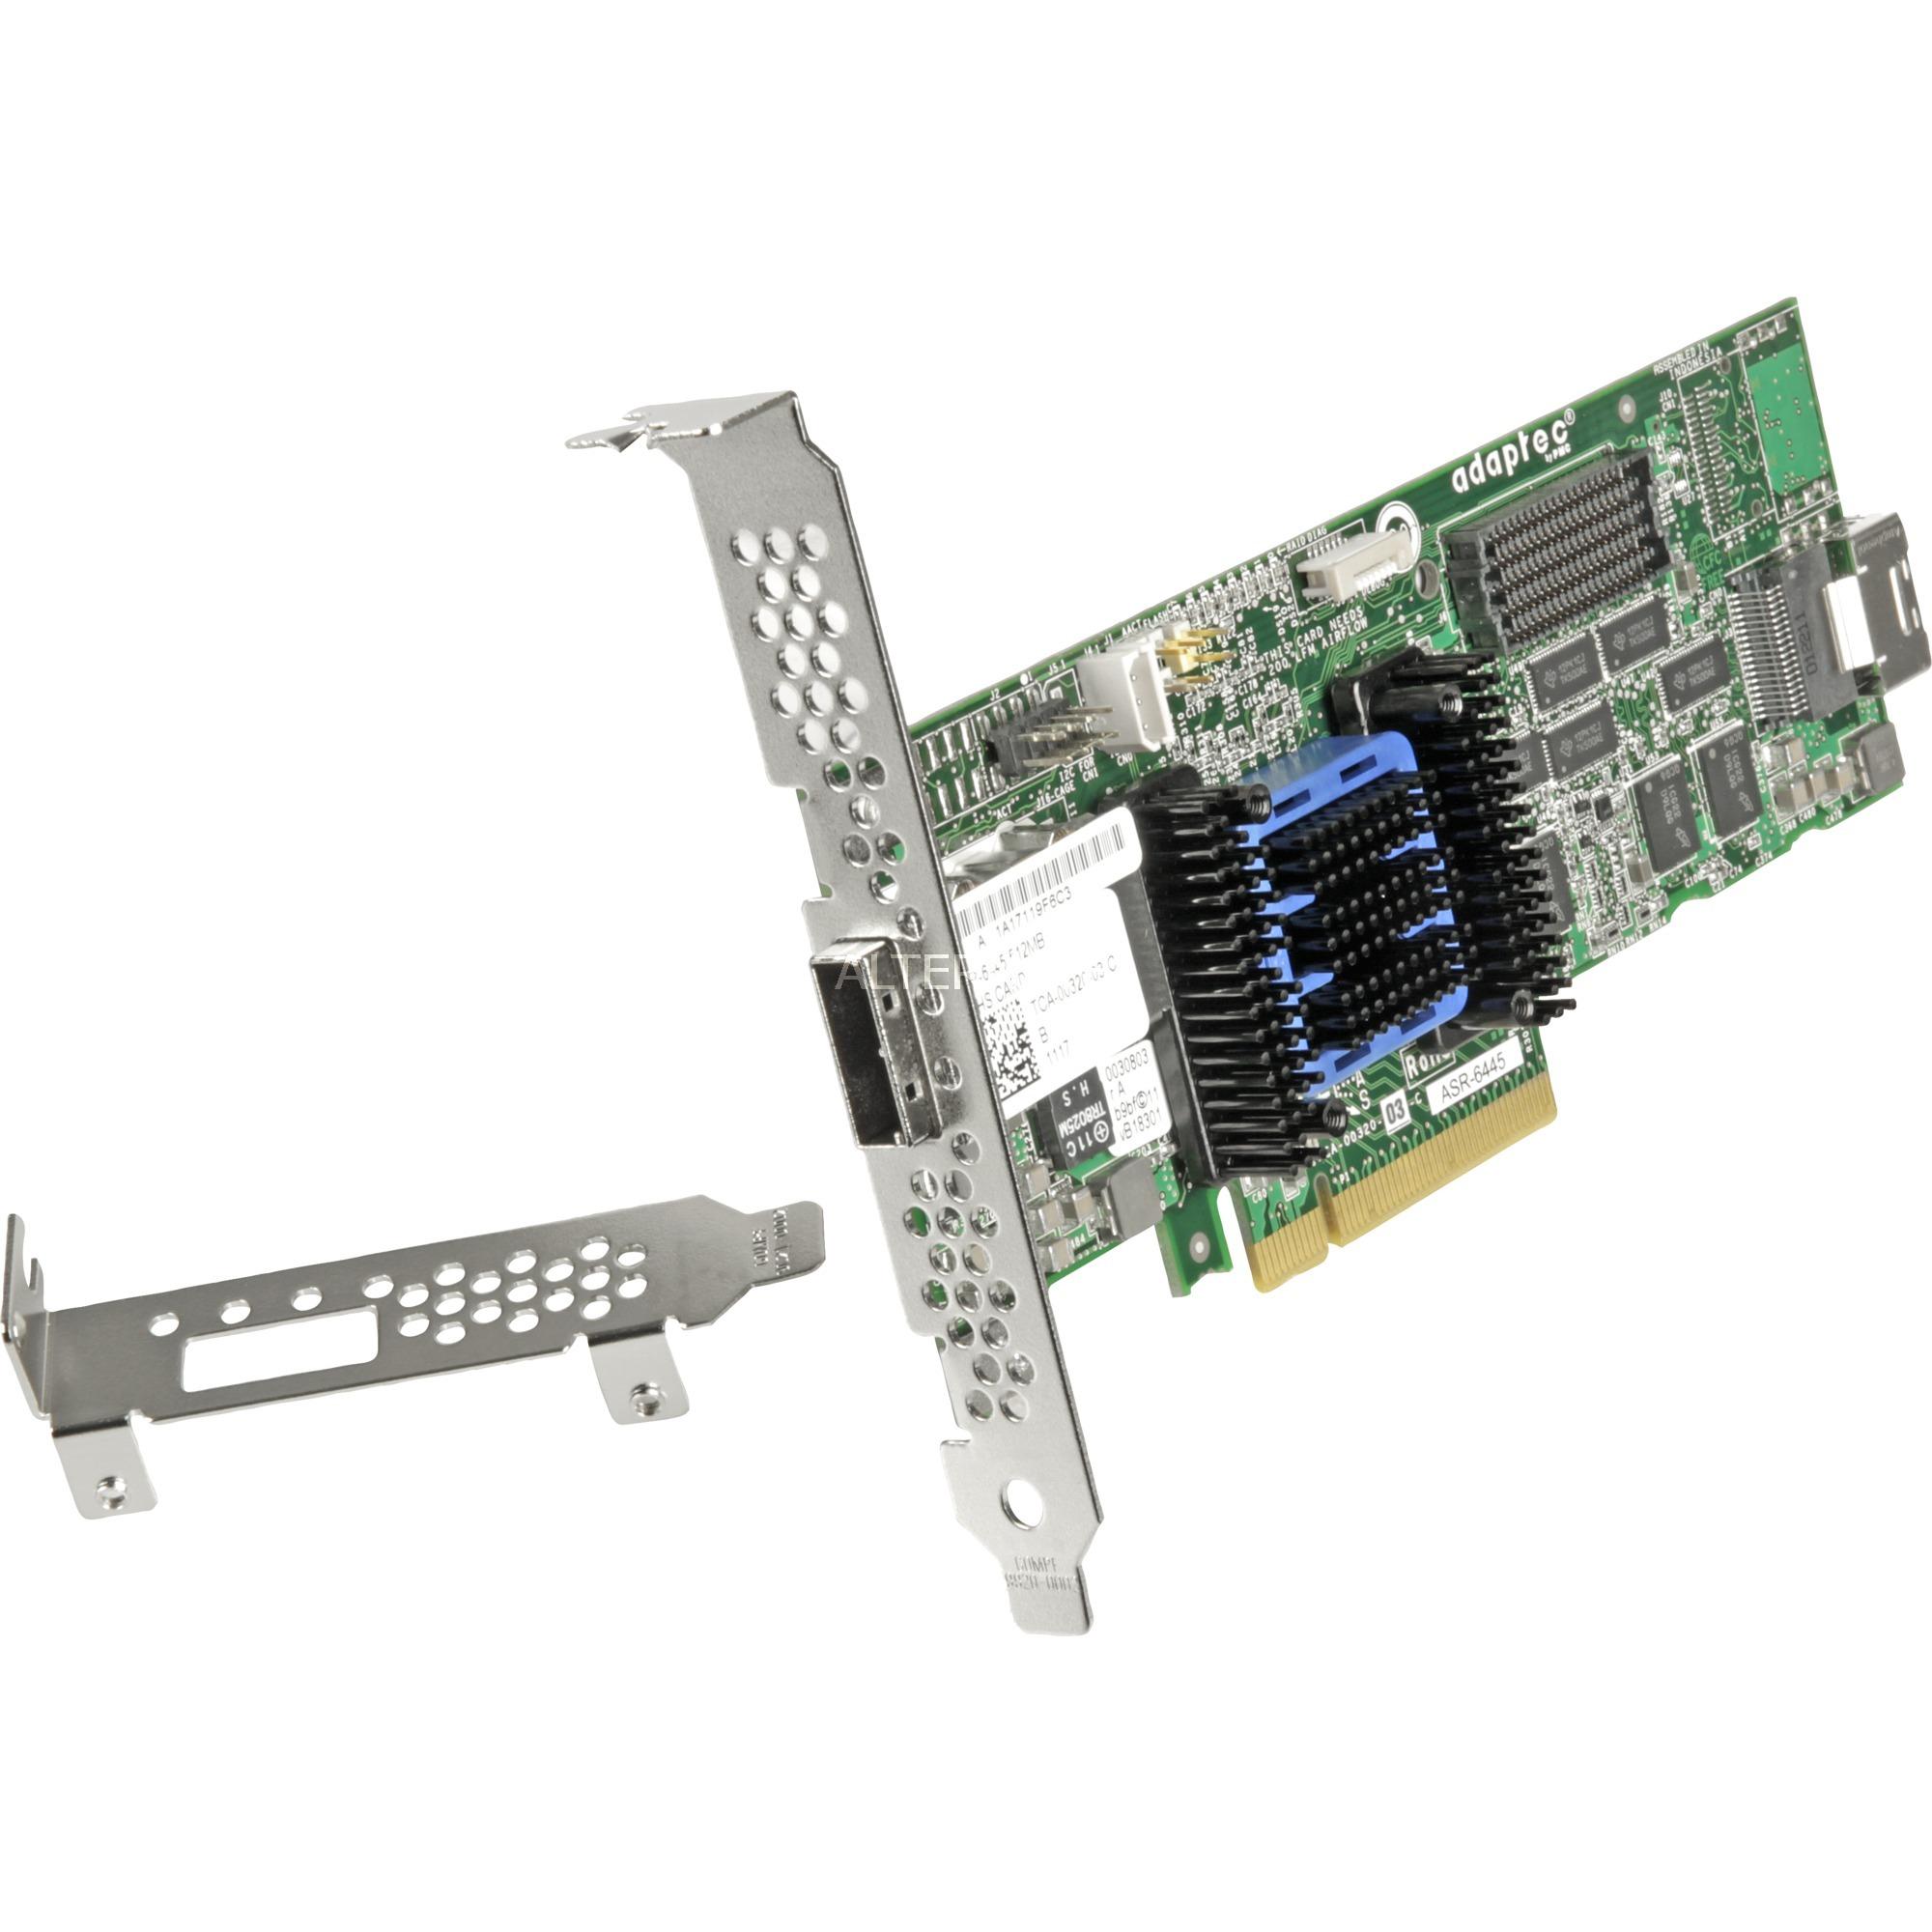 Microsemi Adaptec RAID 6445 Controller Windows Vista 32-BIT